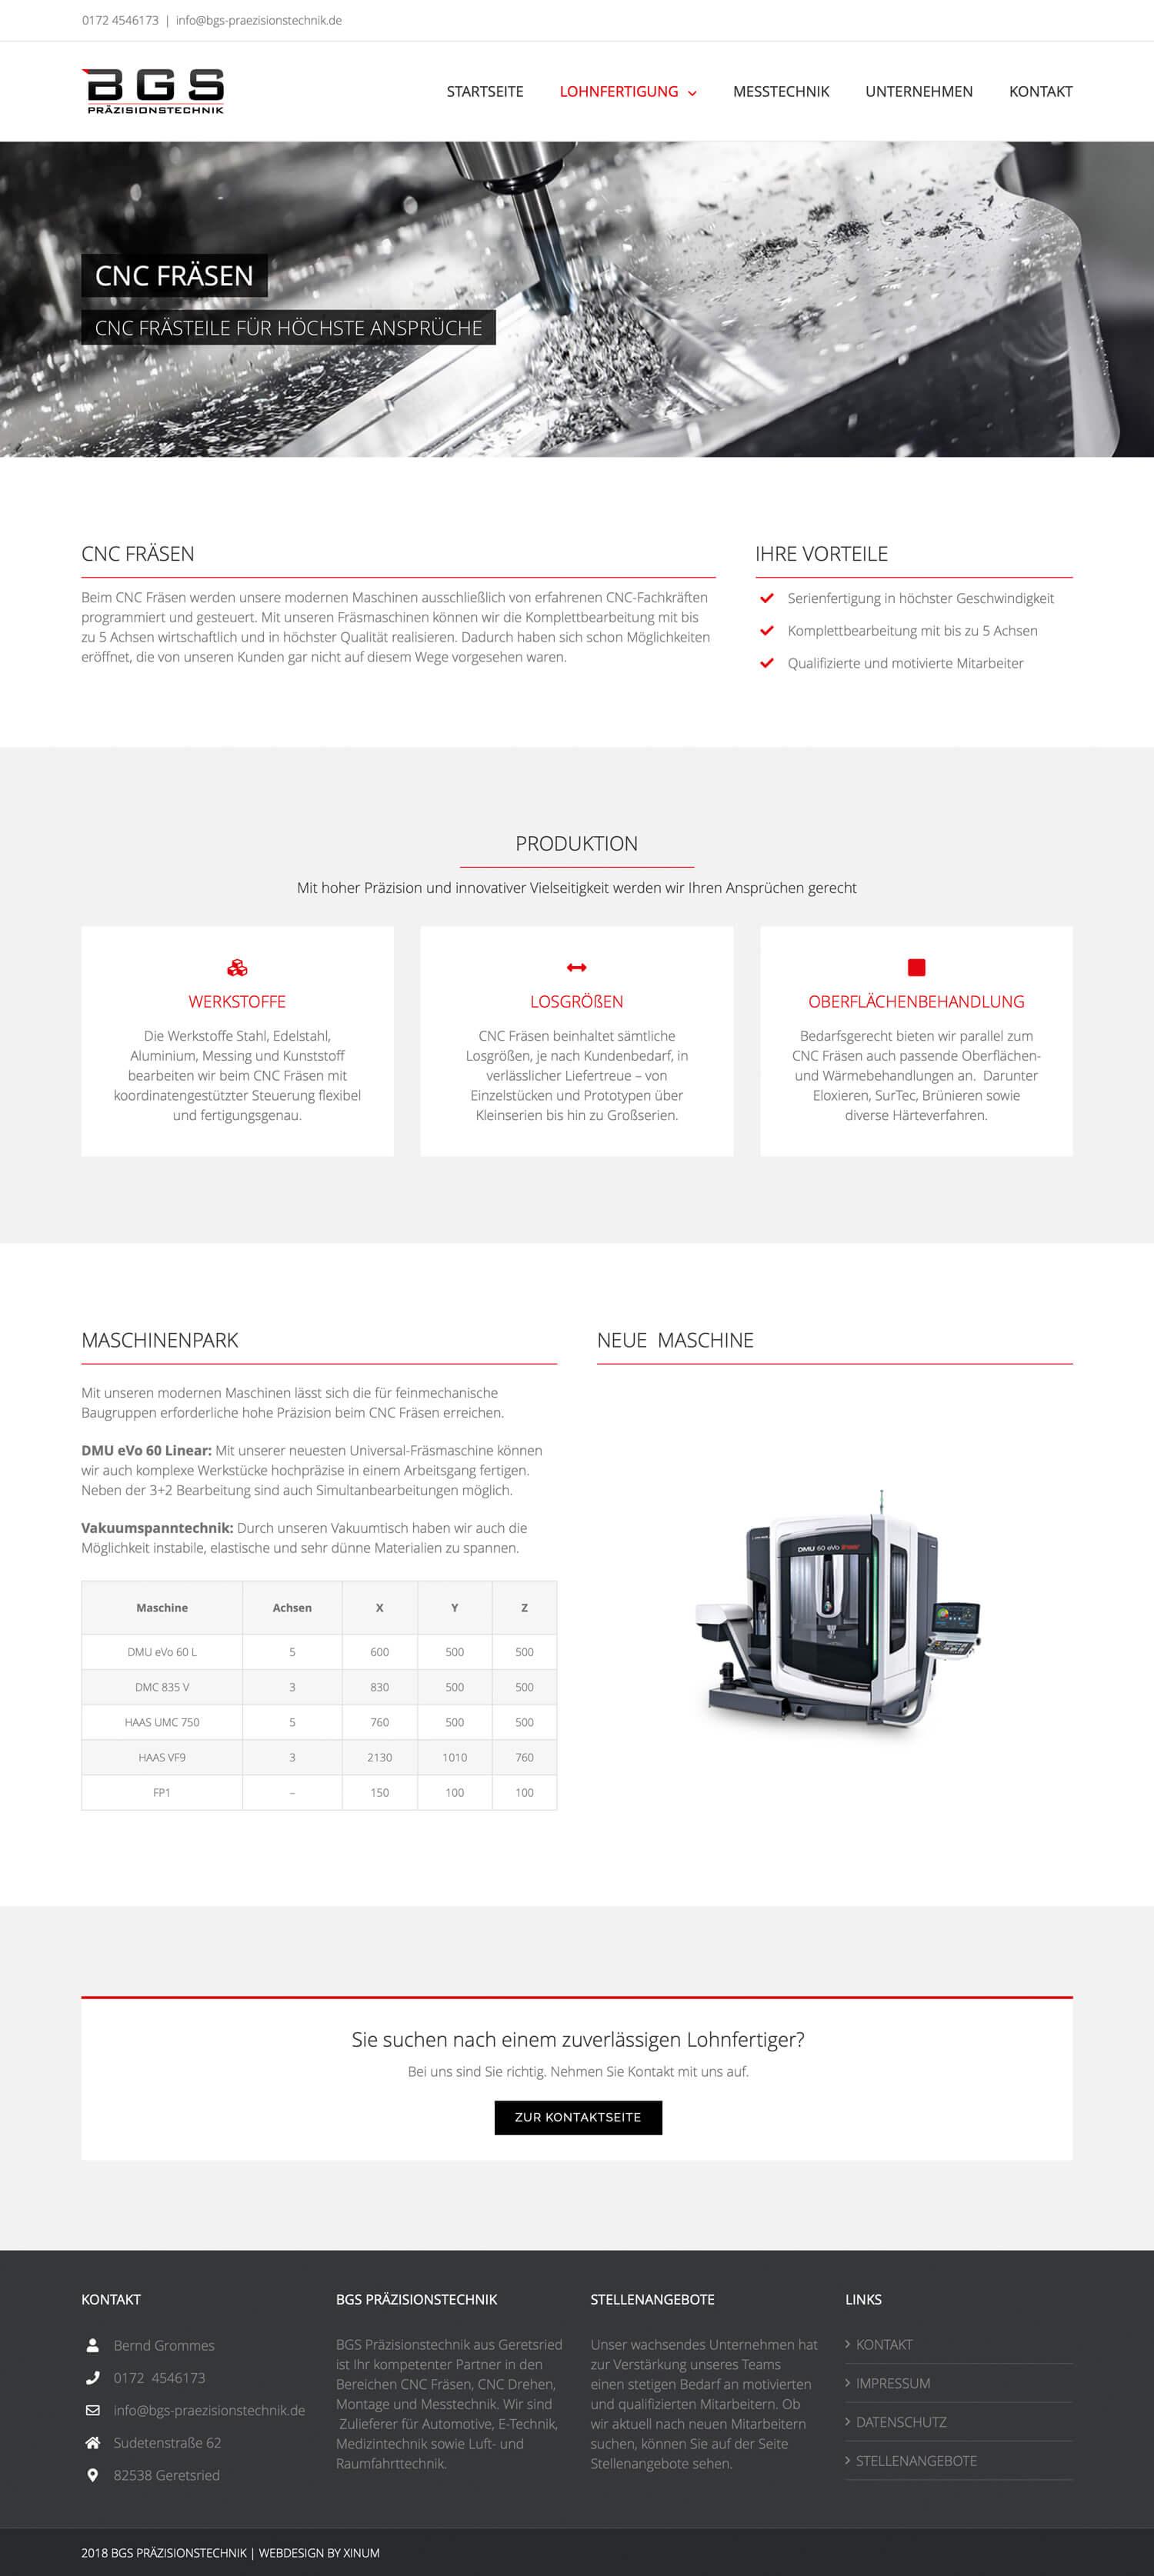 Website BGS Präzisionstechnik